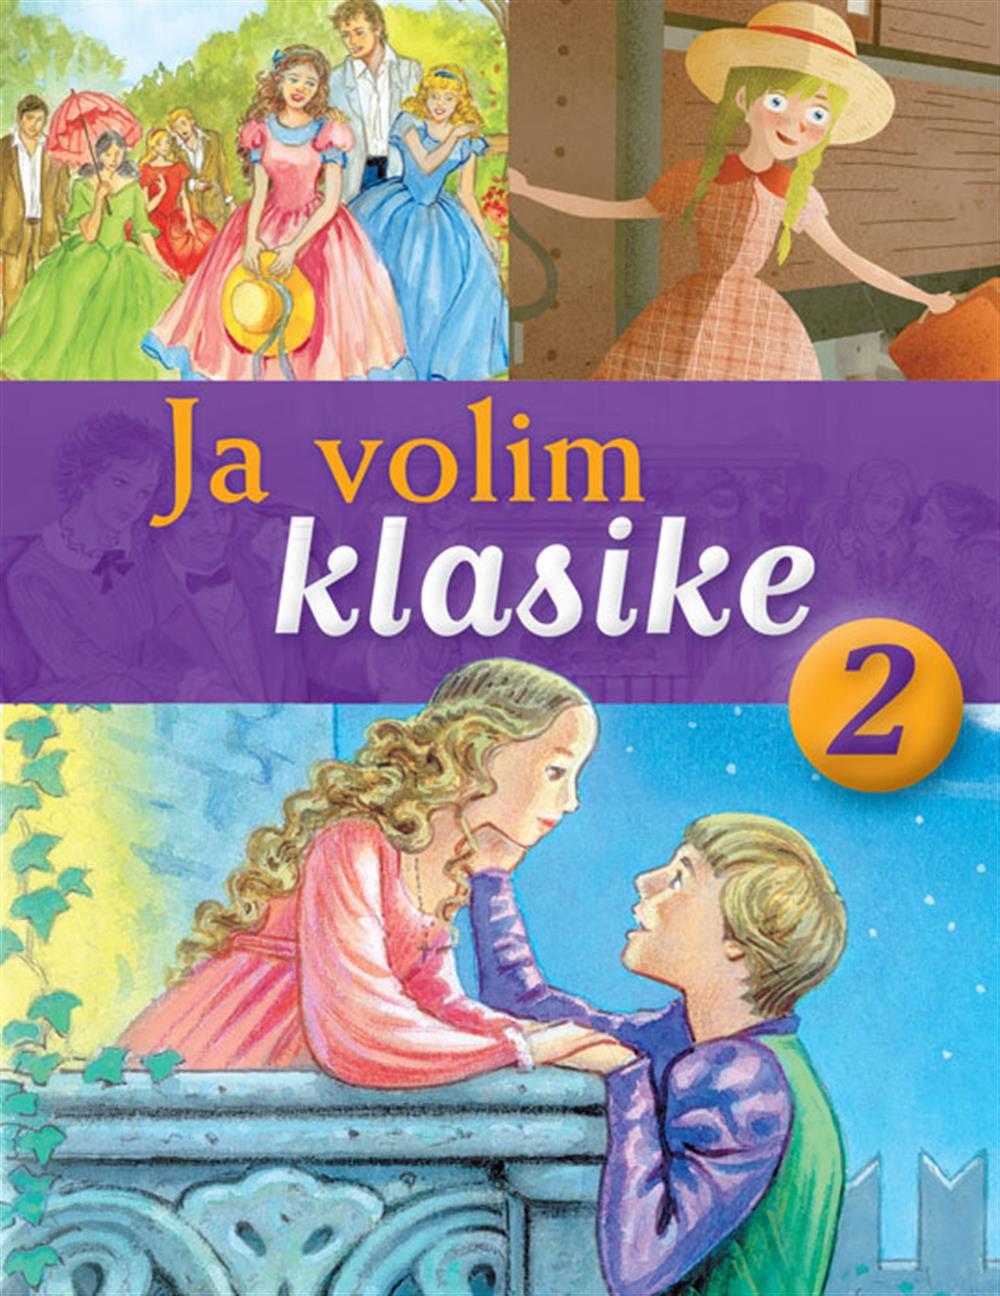 JA VOLIM KLASIKE 2 Devojčice Polijana i Romeo i Julija